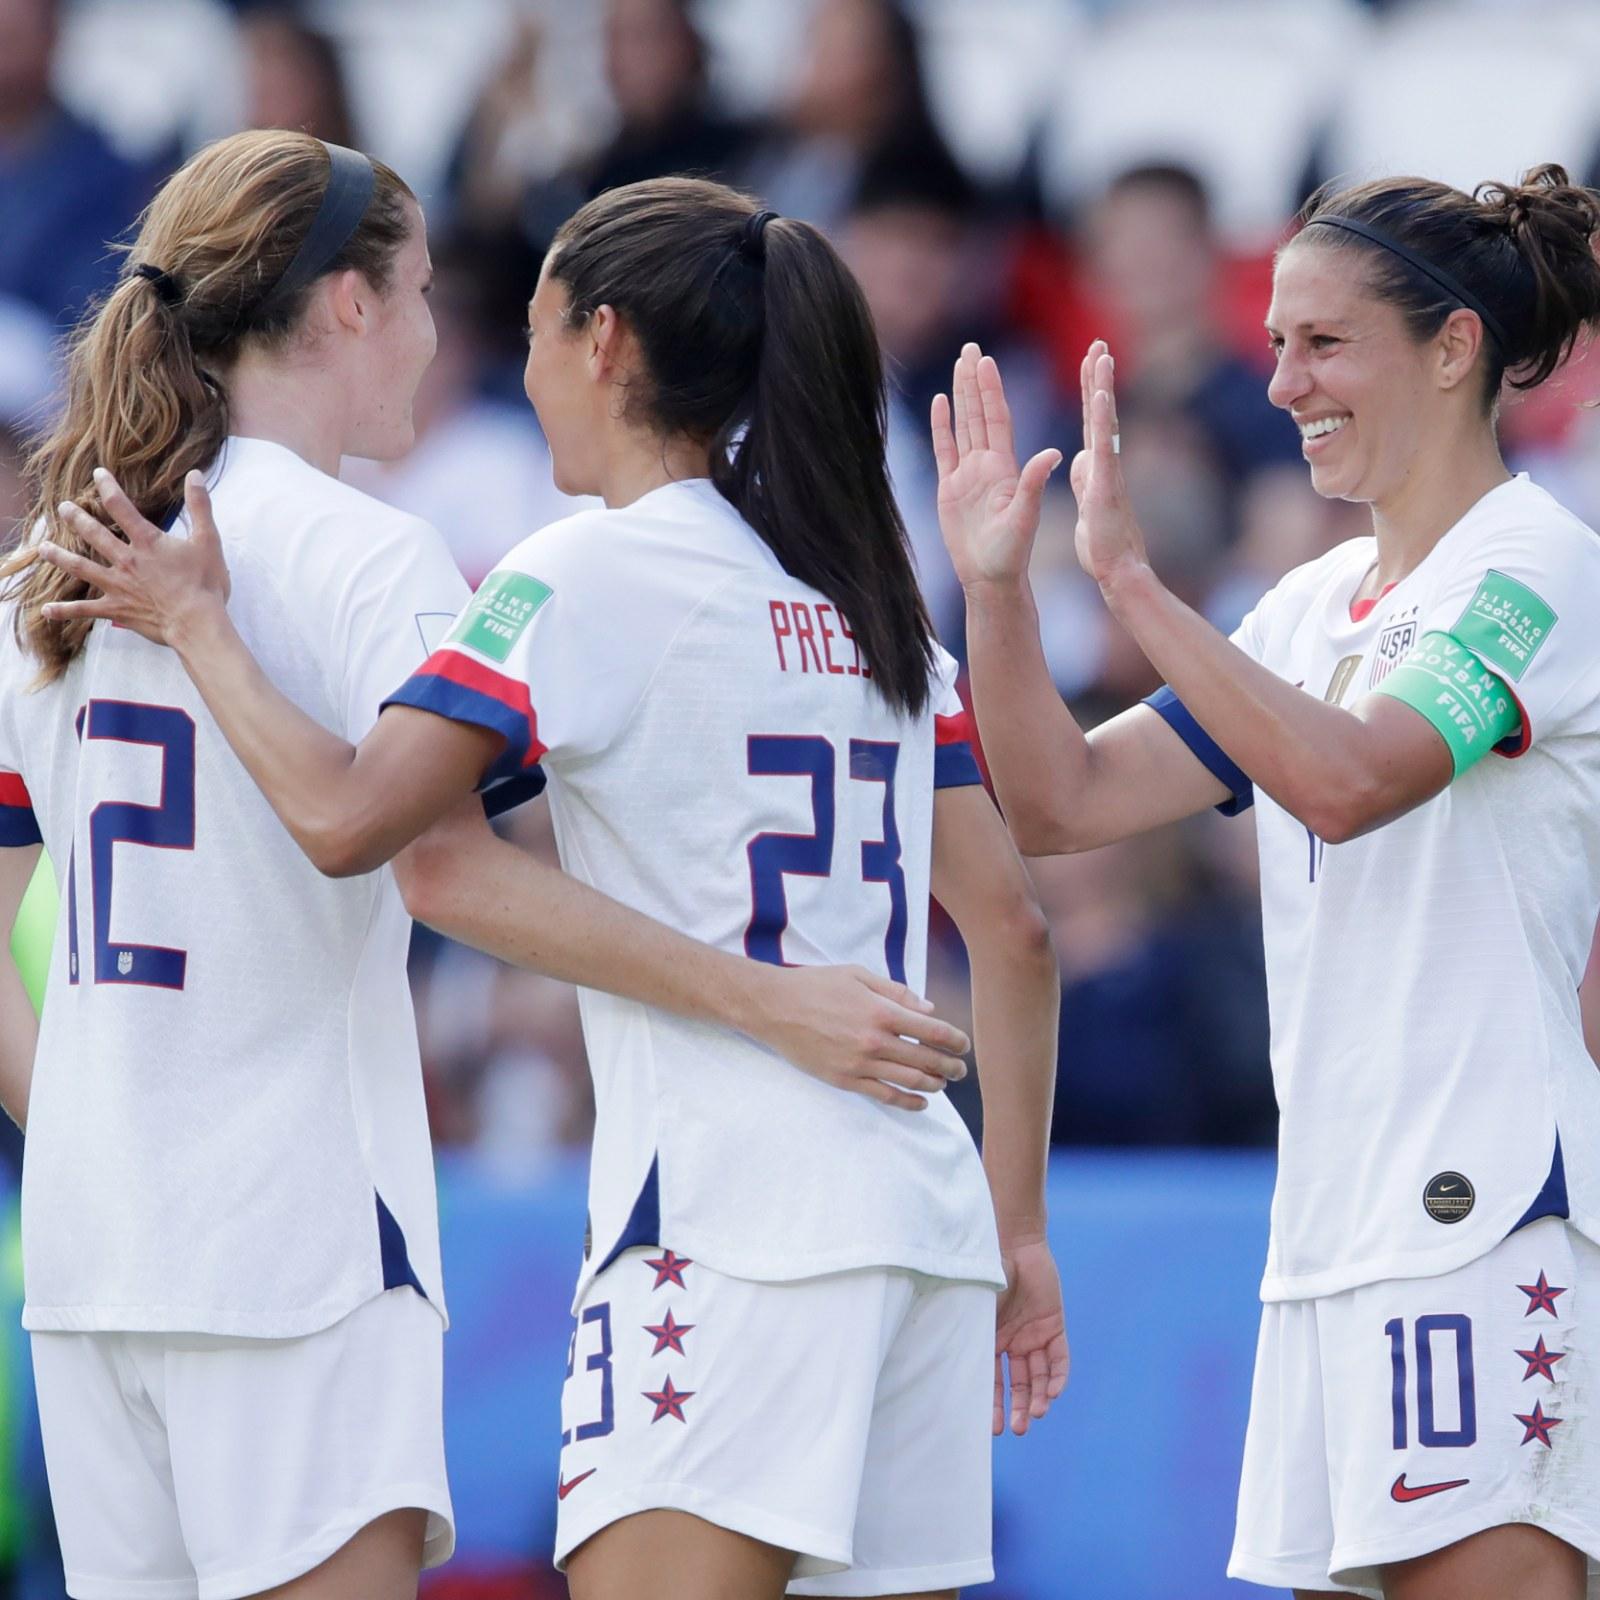 Women's World Cup 2019: Round of 16 Schedule, Power Rankings